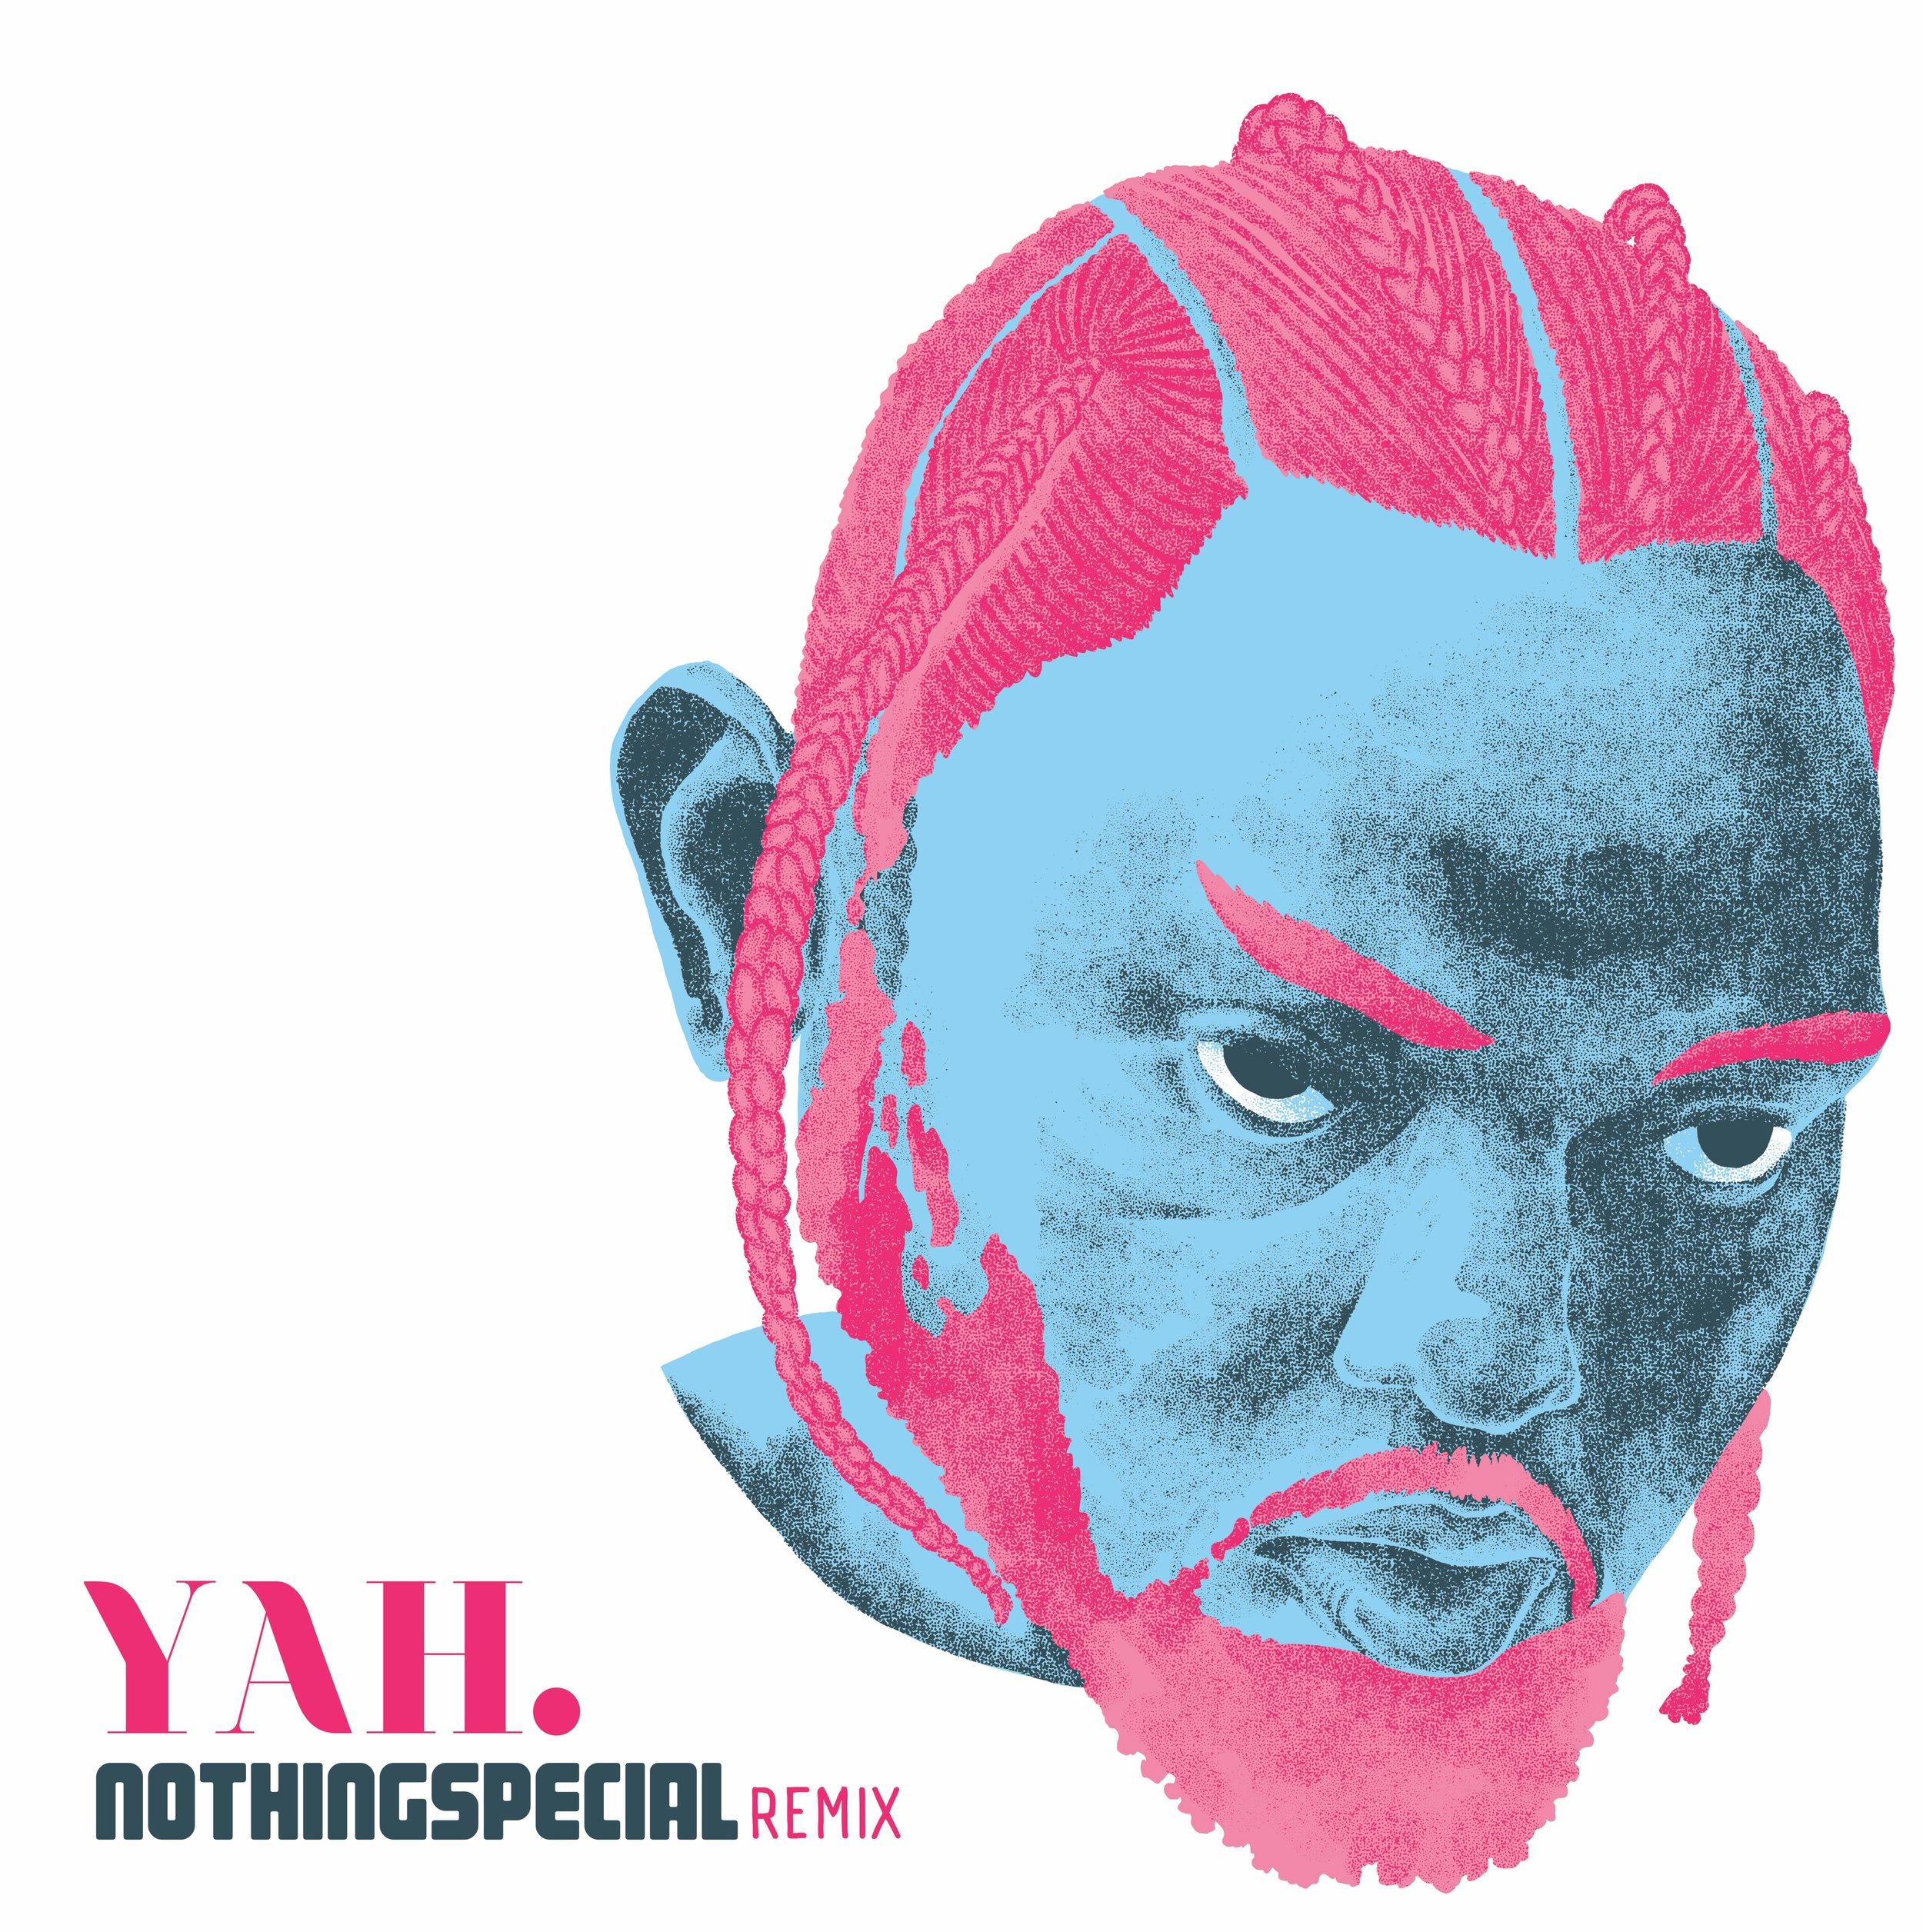 NOTHINGSPECIAL-yah remix. final.jpg.jpeg